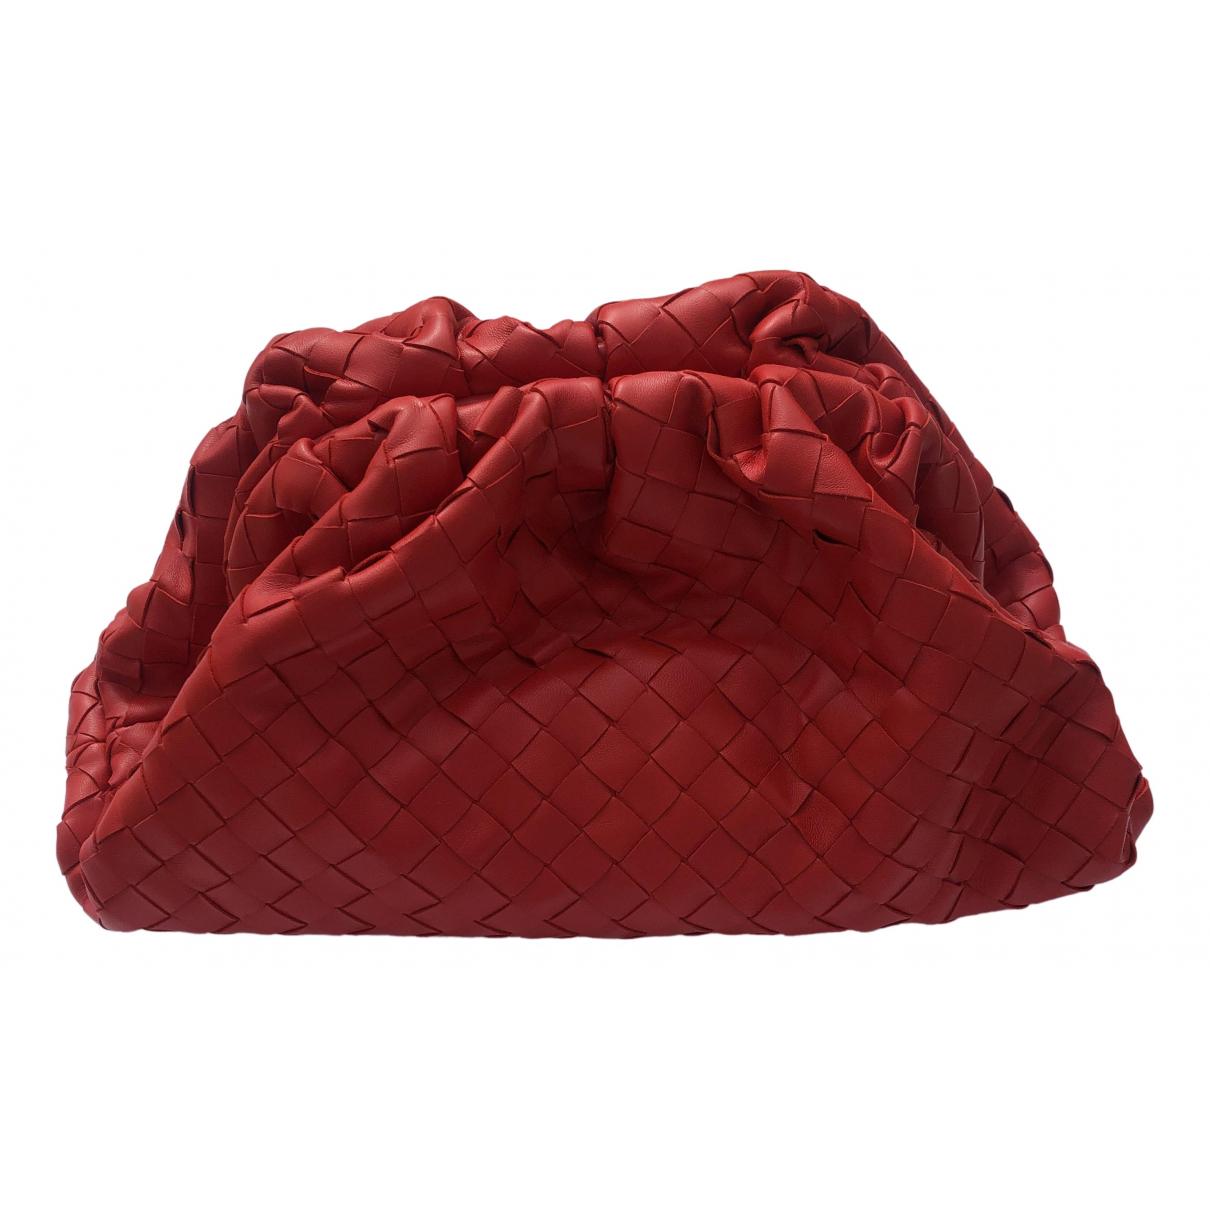 Bottega Veneta Pouch Clutch in  Rot Leder